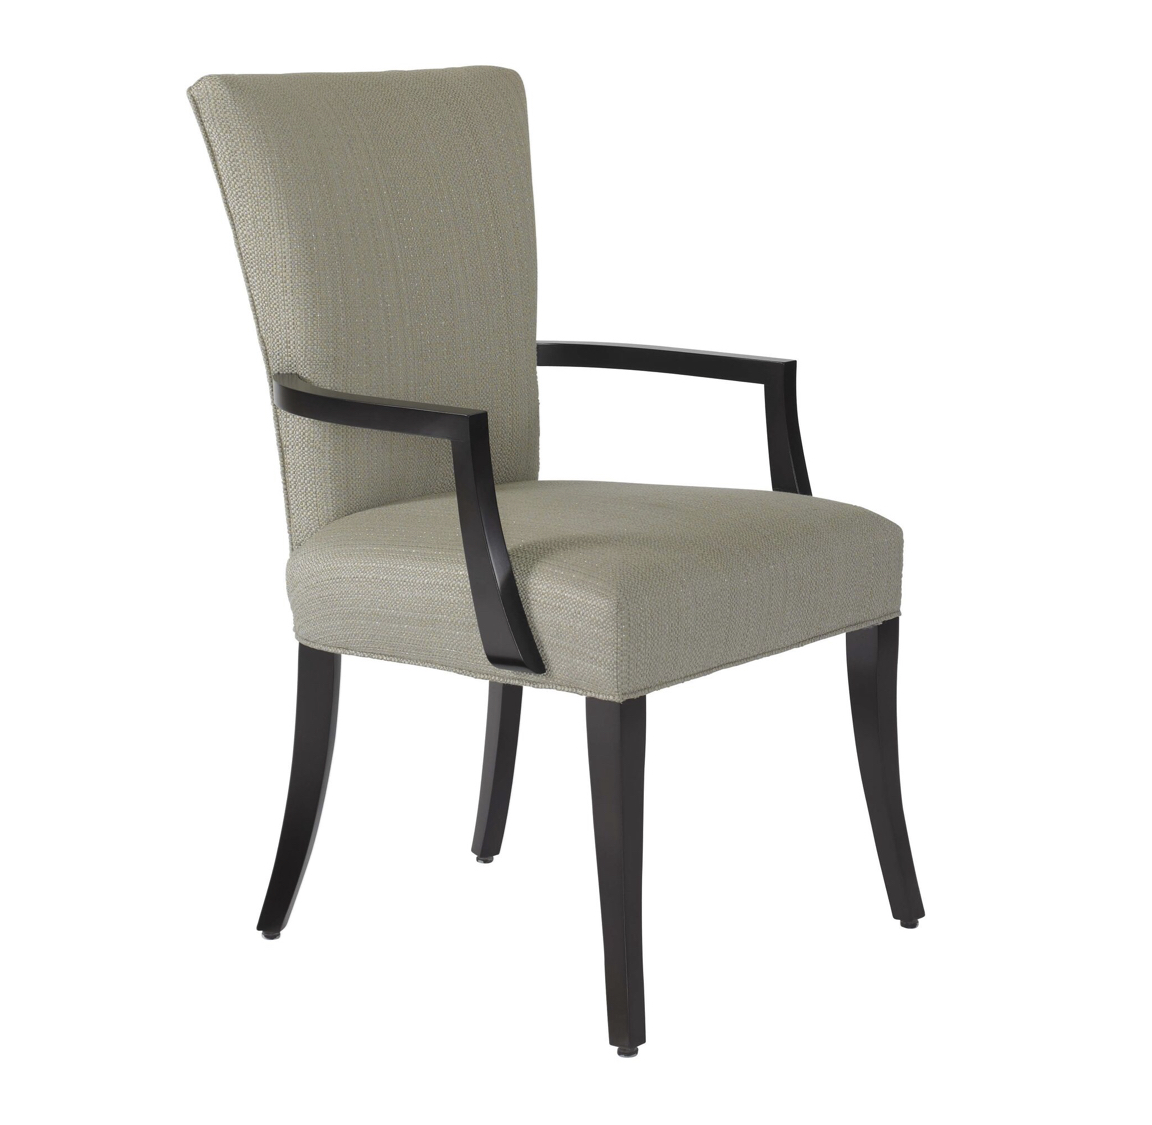 Danbury Dining chair